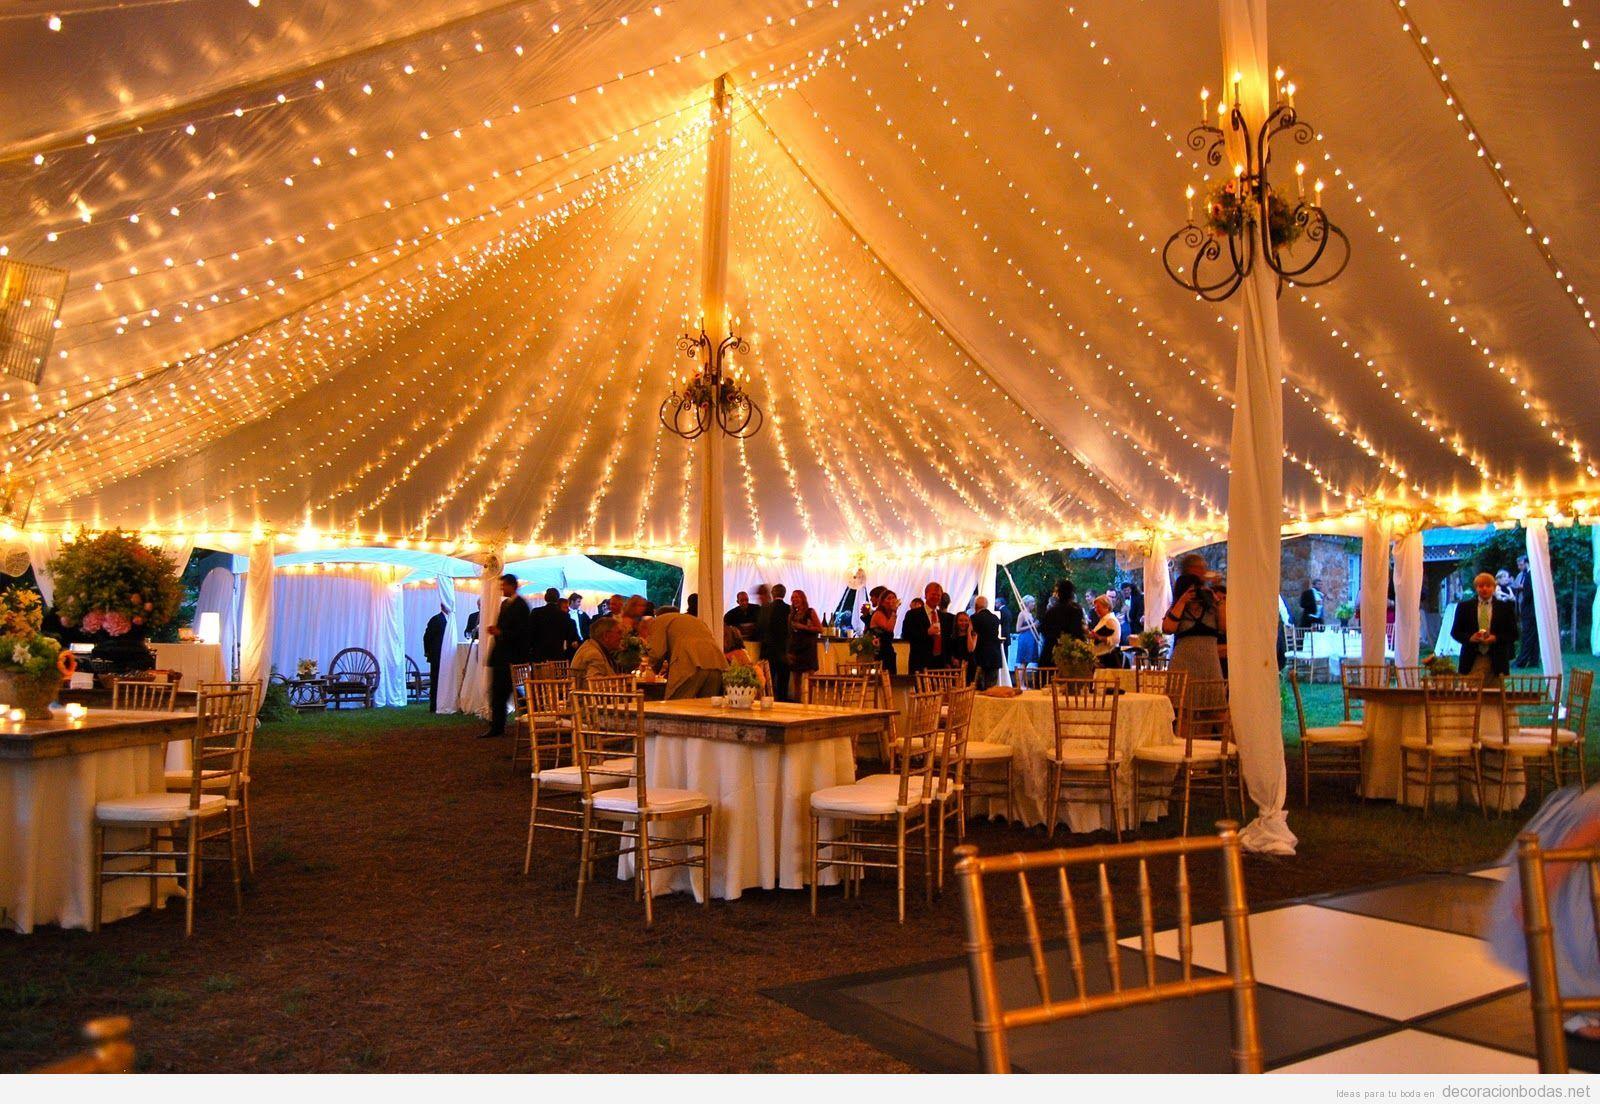 Decoraci n de boda carpa con luces novias 2 pinterest - Decoracion de carpas para bodas ...